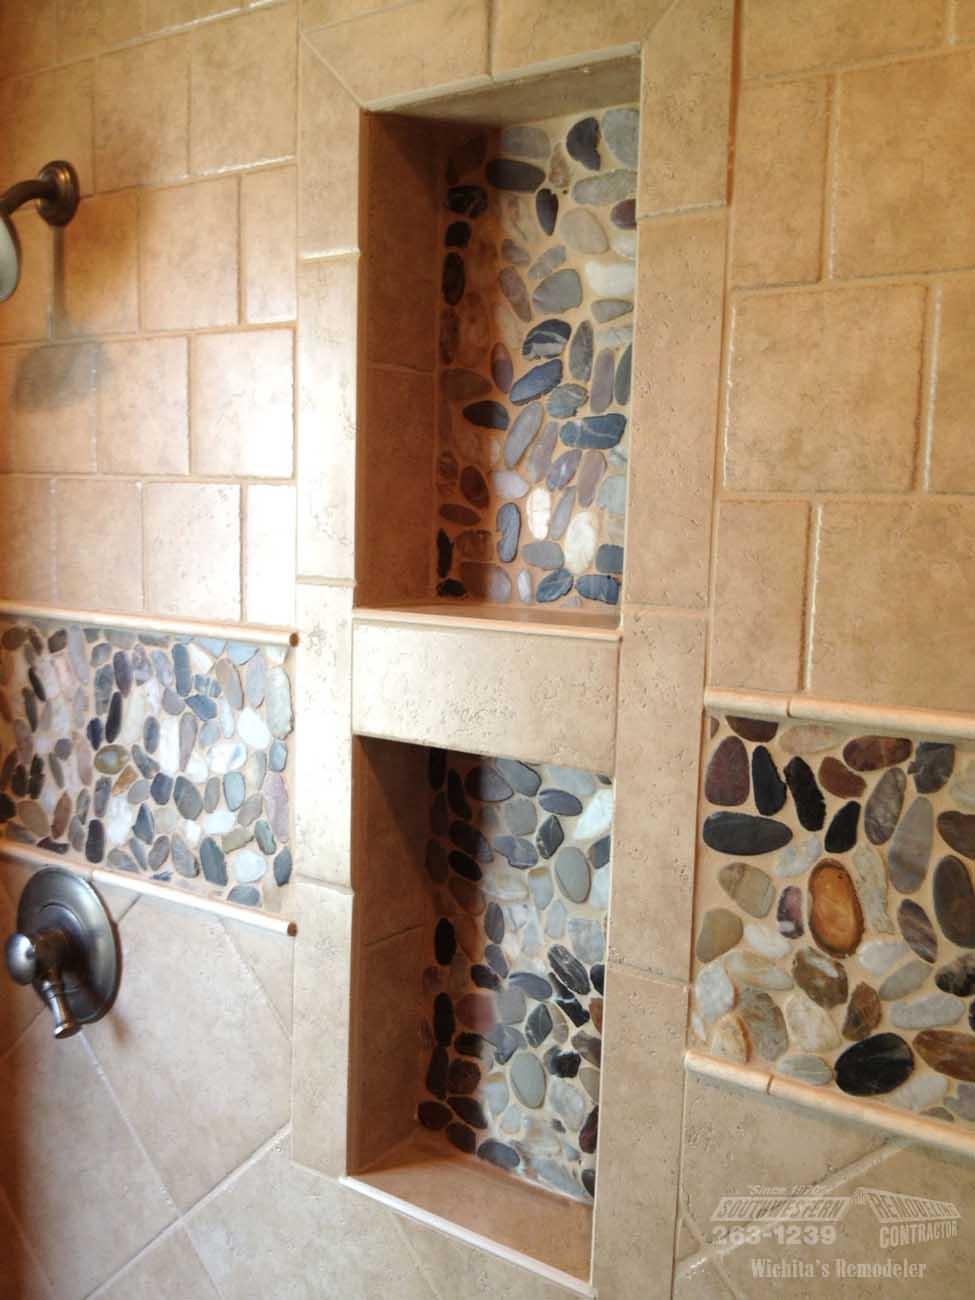 bathroom remodeling wichita ks. 24 · Bathroom Remodeling Wichita Home Remodeler Ks